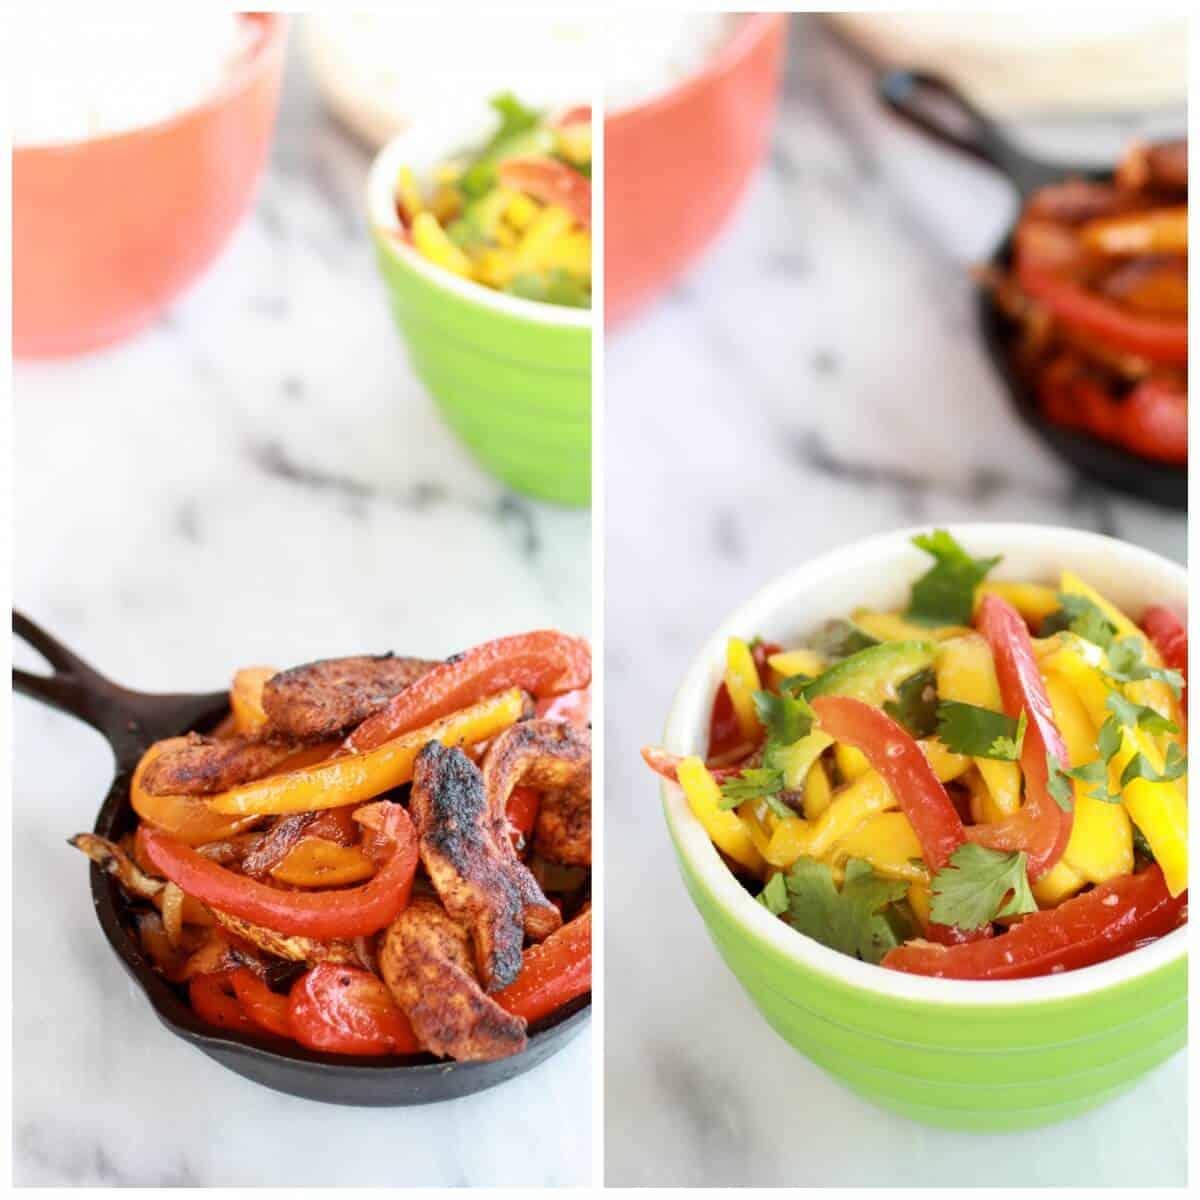 Easy Chicken Fajitas with Thai Mango Slaw and Coconut Rice | halfbakedharvest.com/